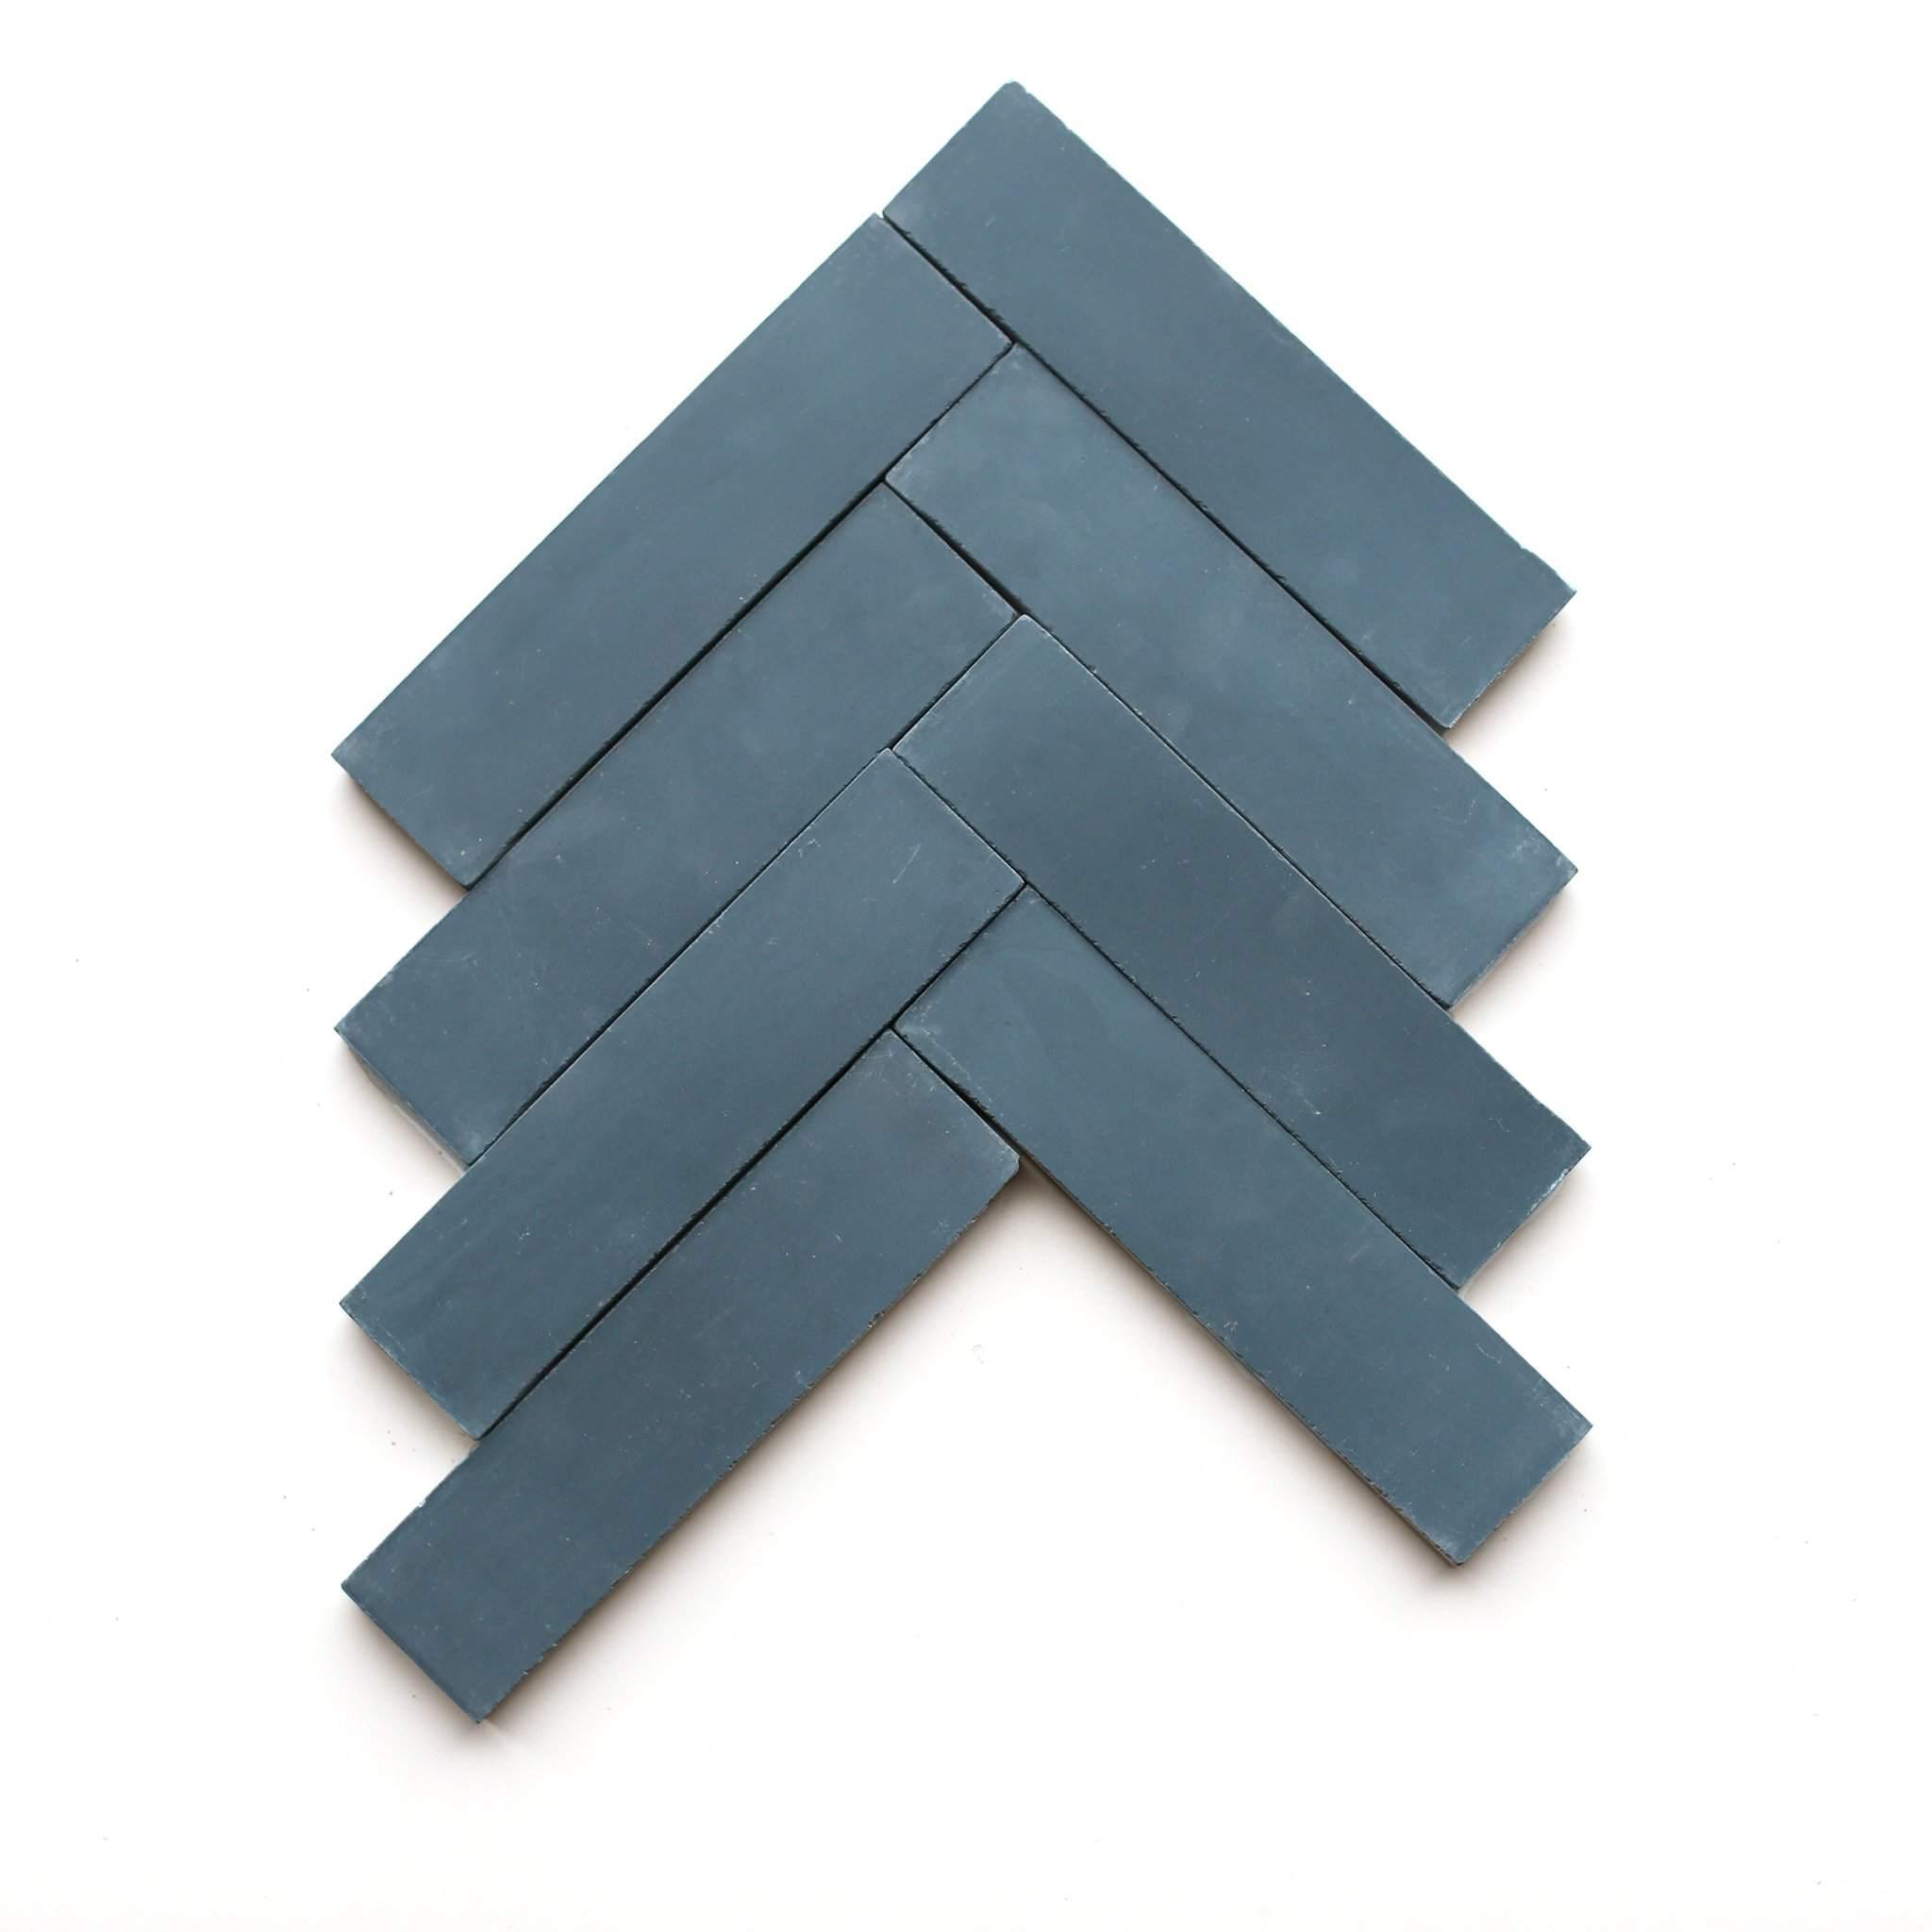 Solid Rectangle—Bathroom Floor Tile Ideas